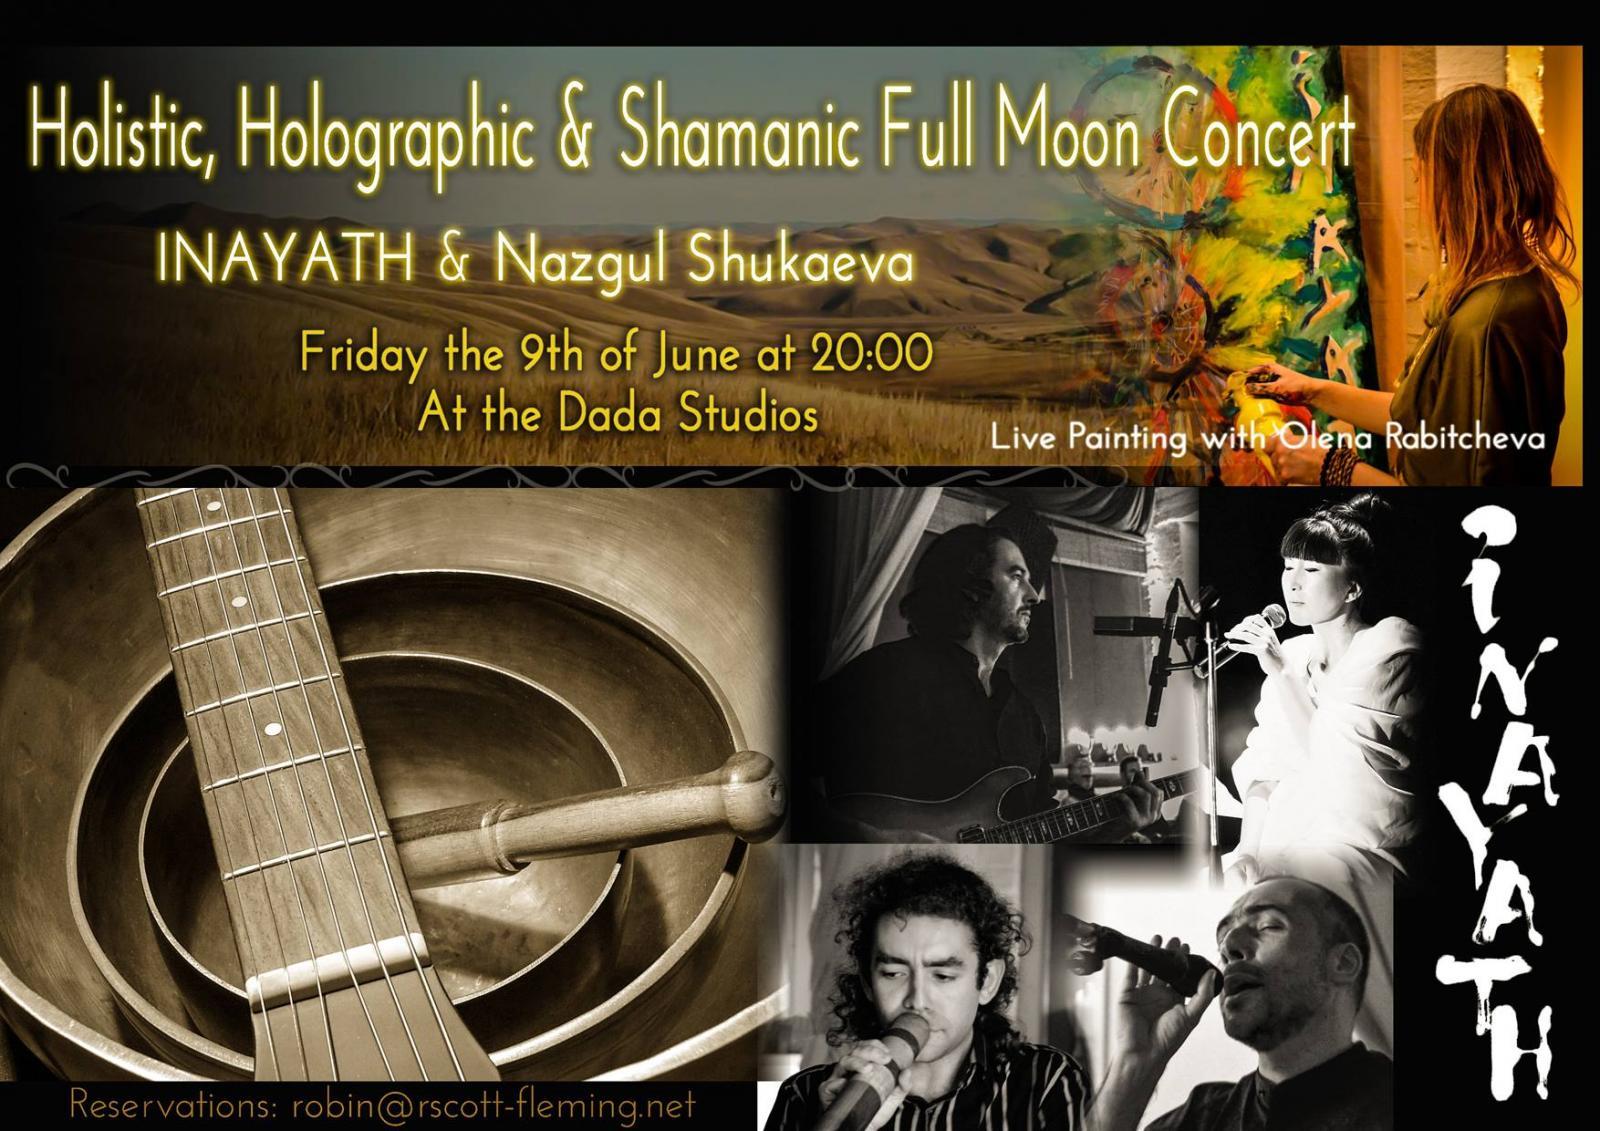 09/06/2017 - Bruxelles (BEL) | Holistic, Holographic & Shamanic Full Moon Concert